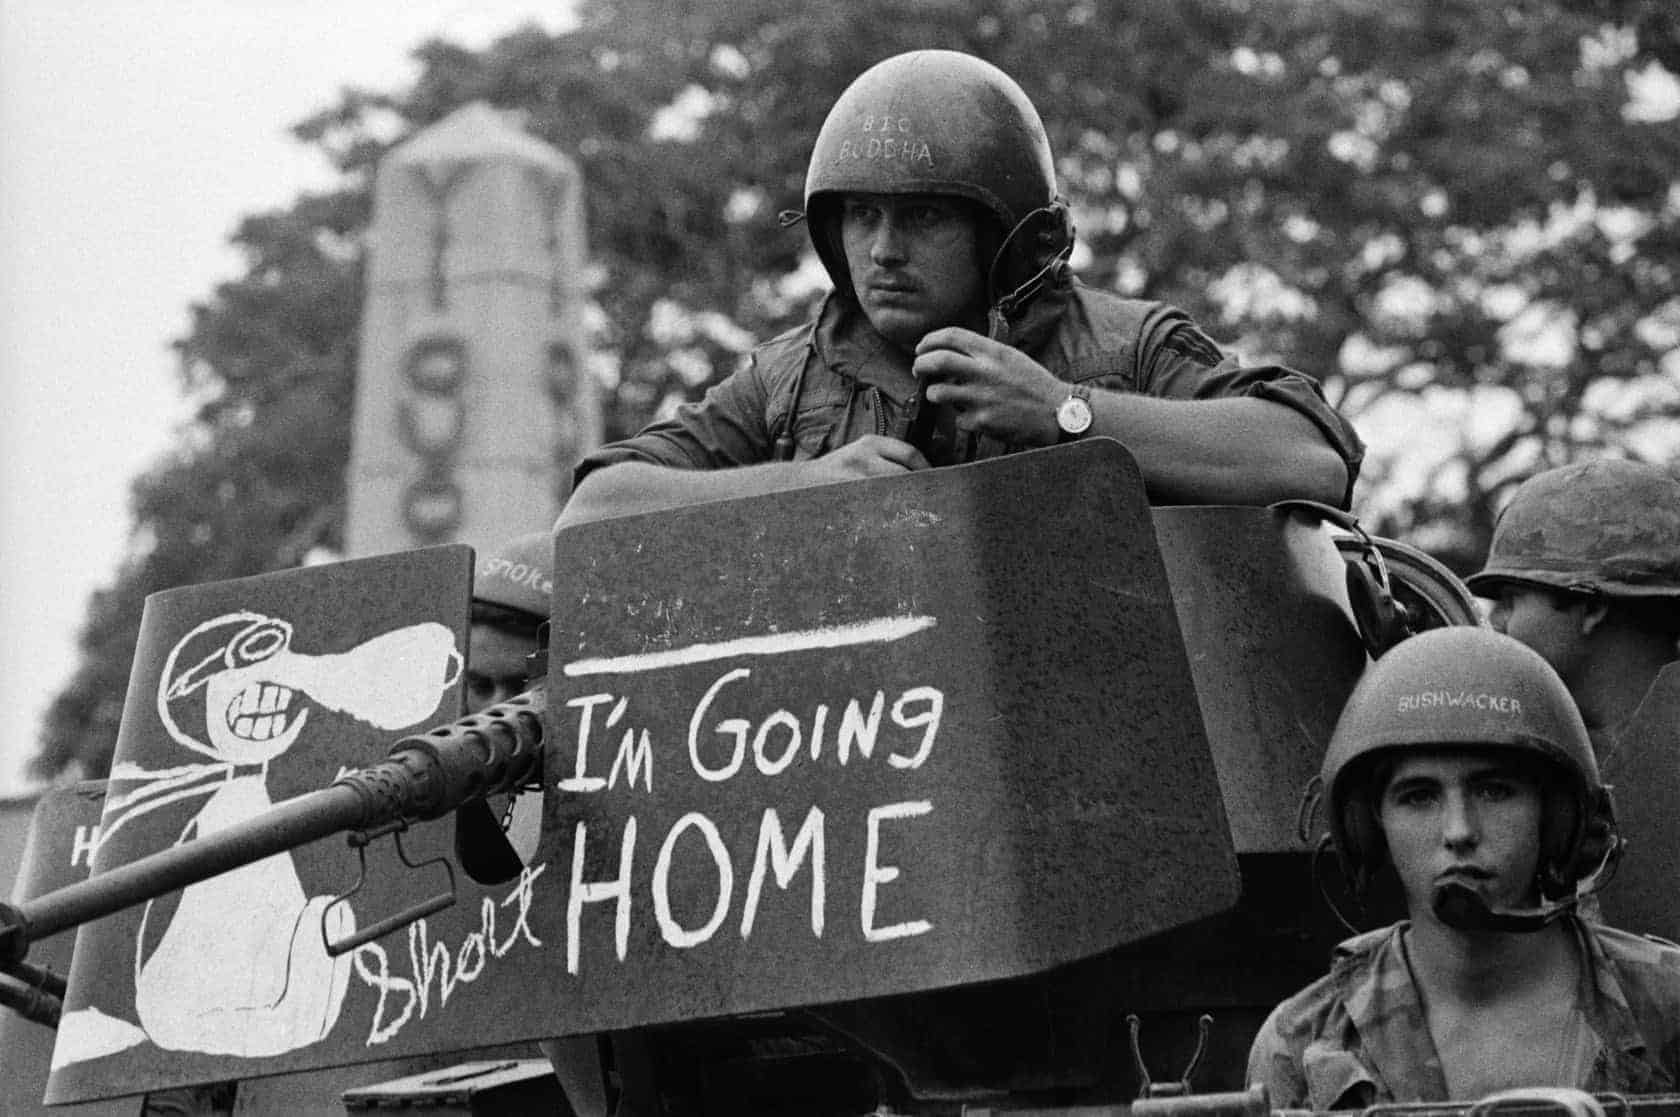 Don McCullin, South Vietnam 1968, printed 2013 | Vietnam